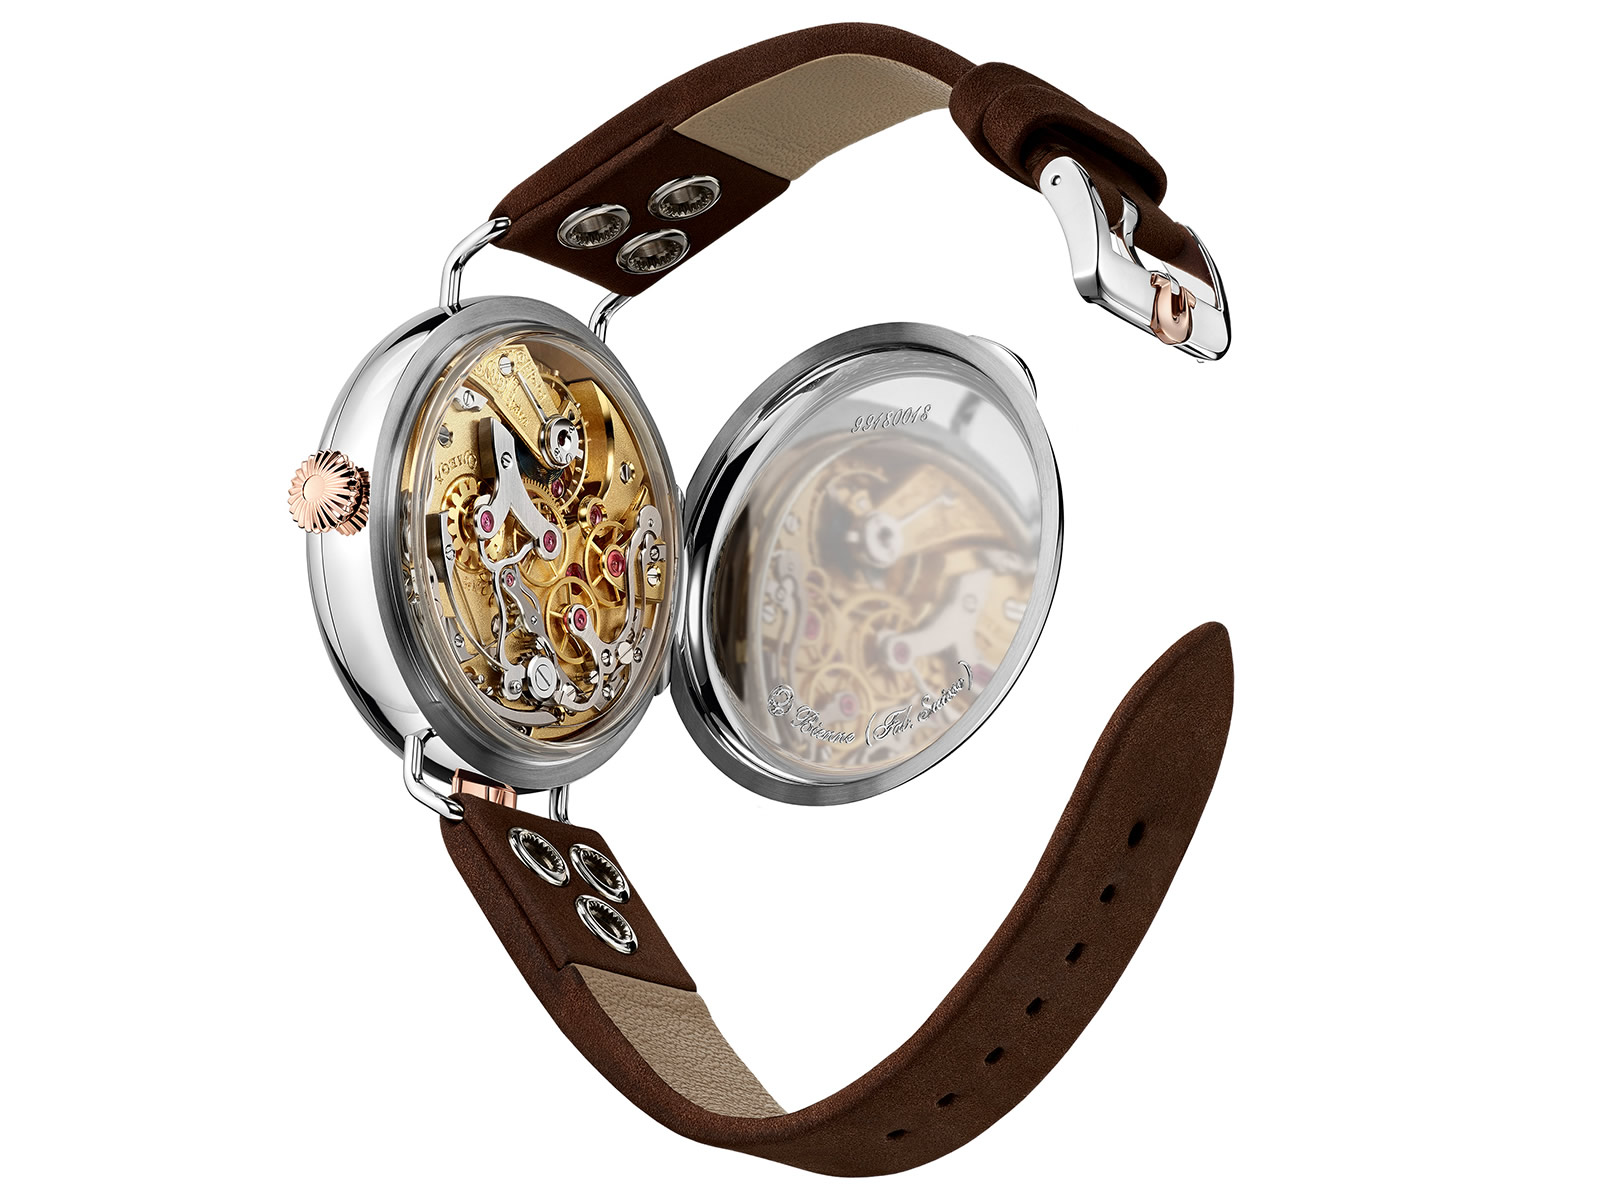 516-52-48-30-04-001-omega-18-chro-wrist-chronograph-limited-edition-10.jpg